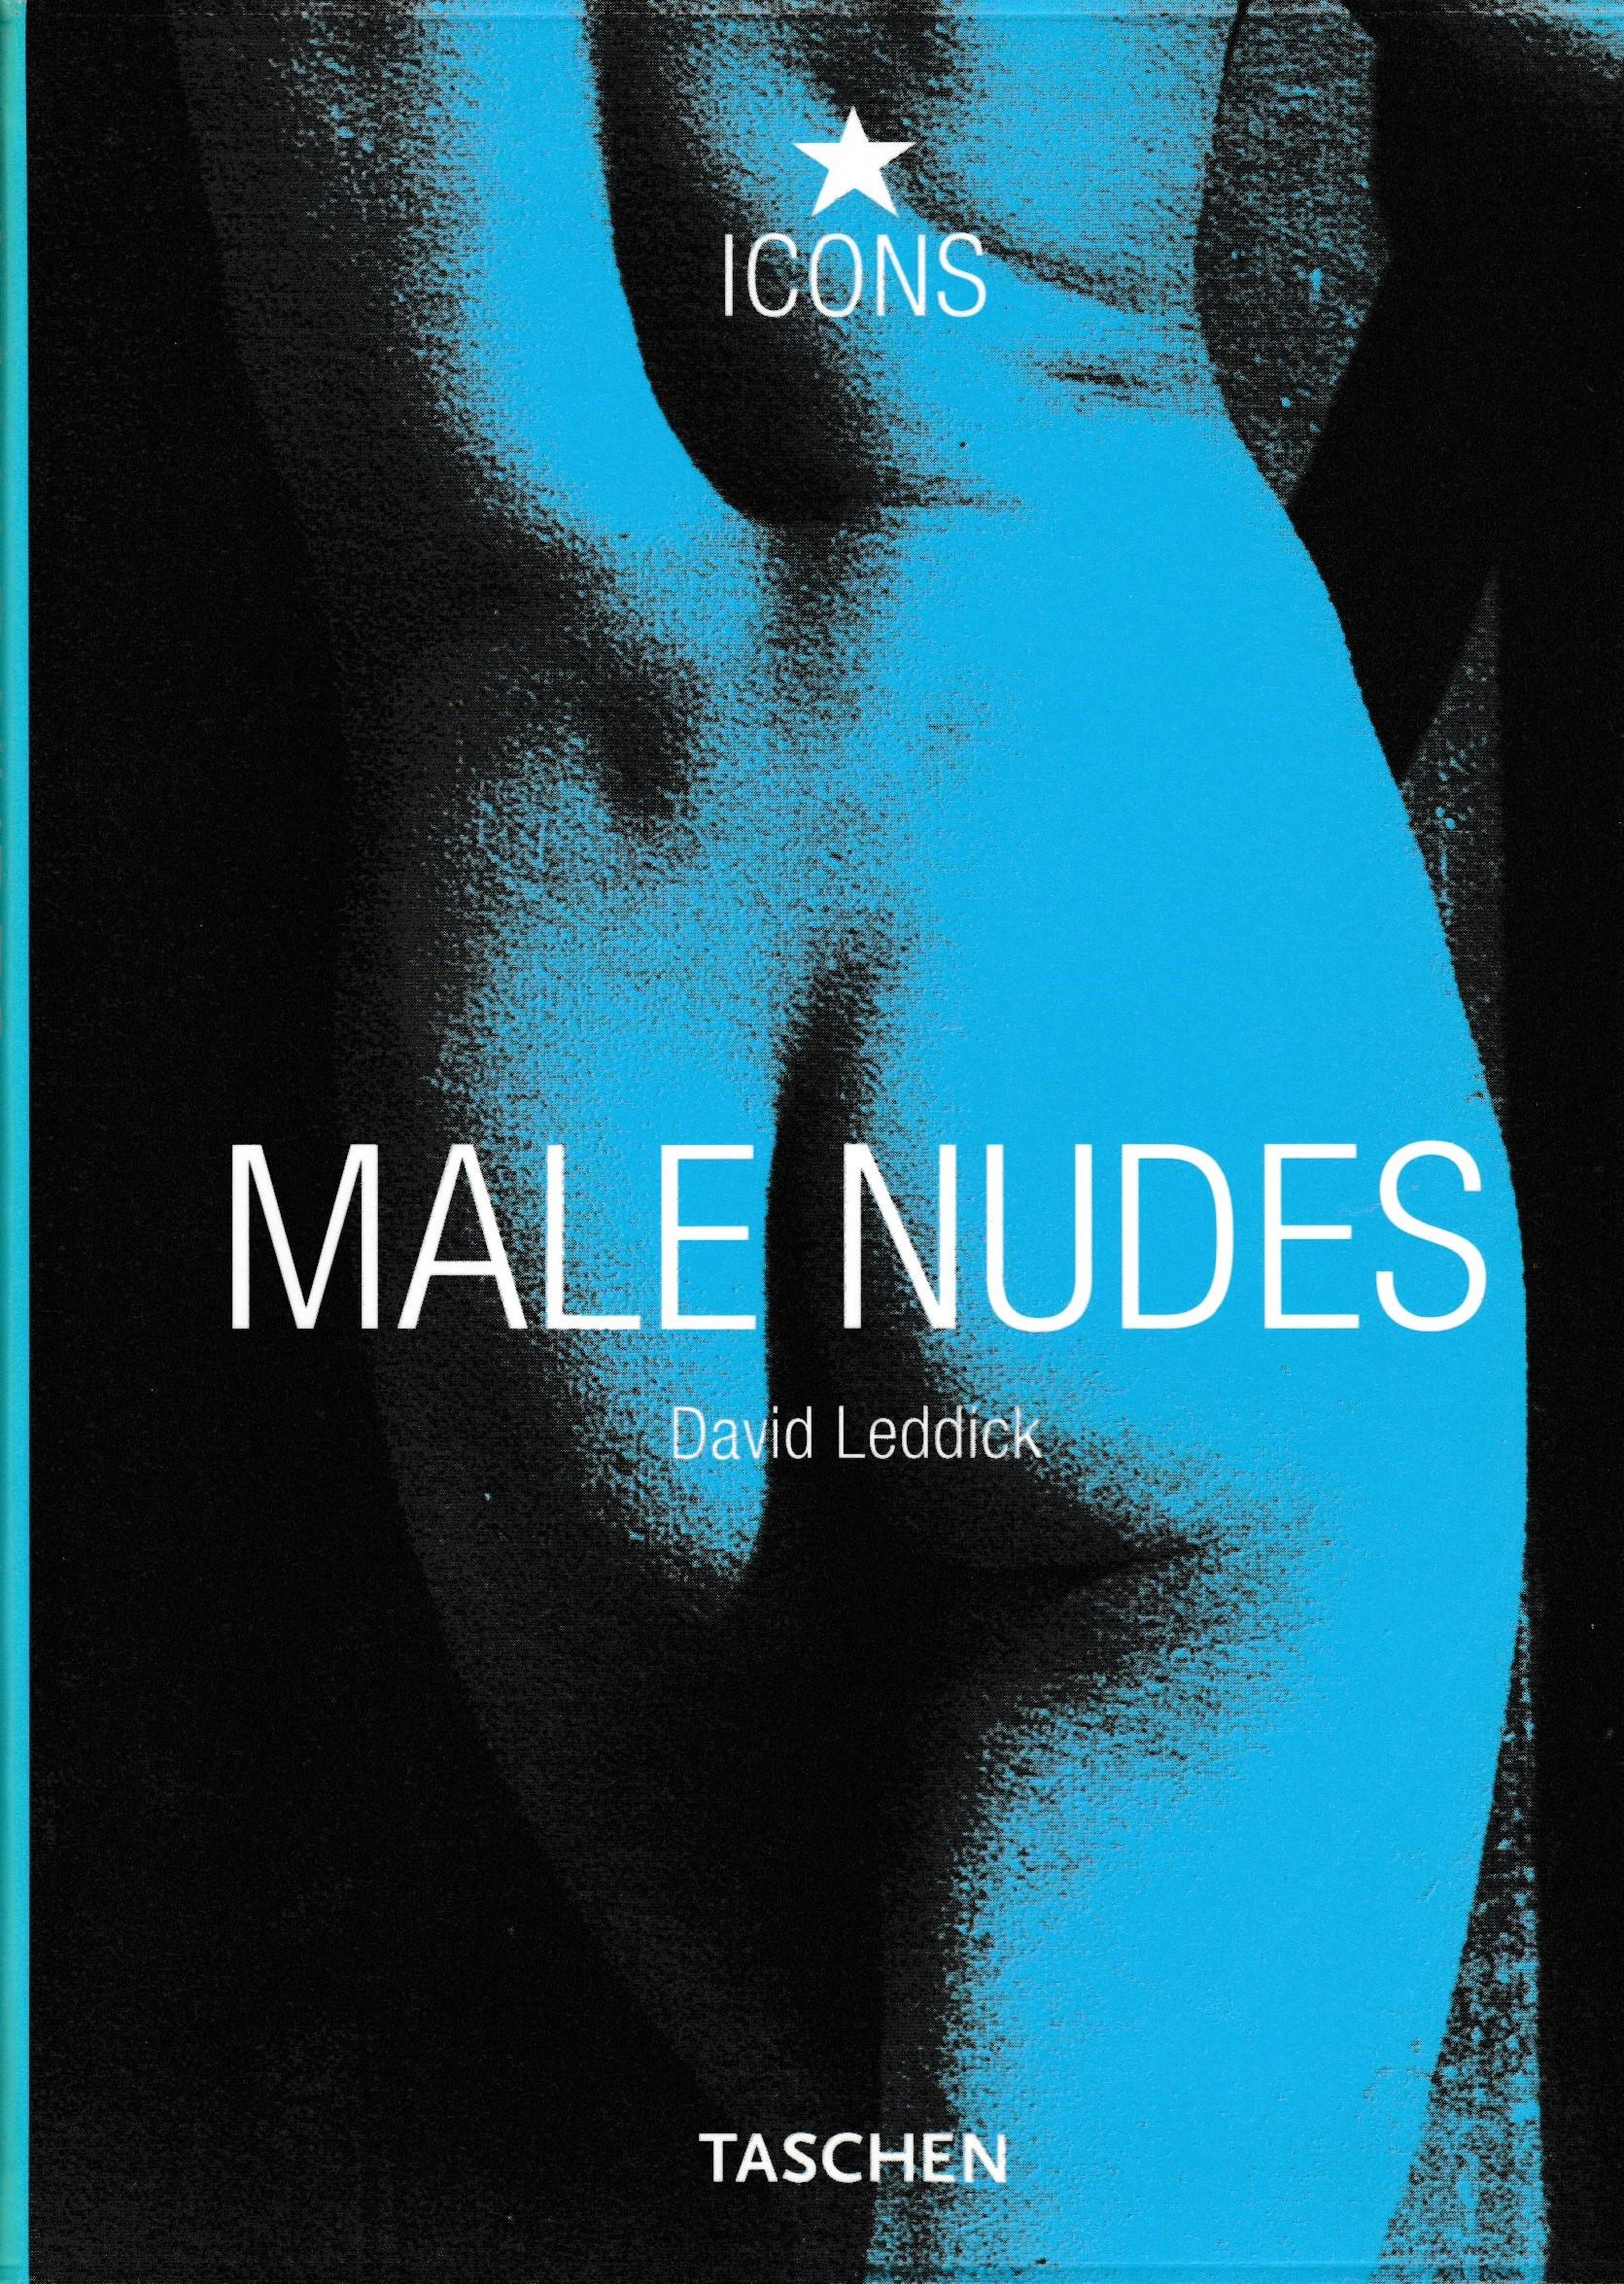 Male Nudes